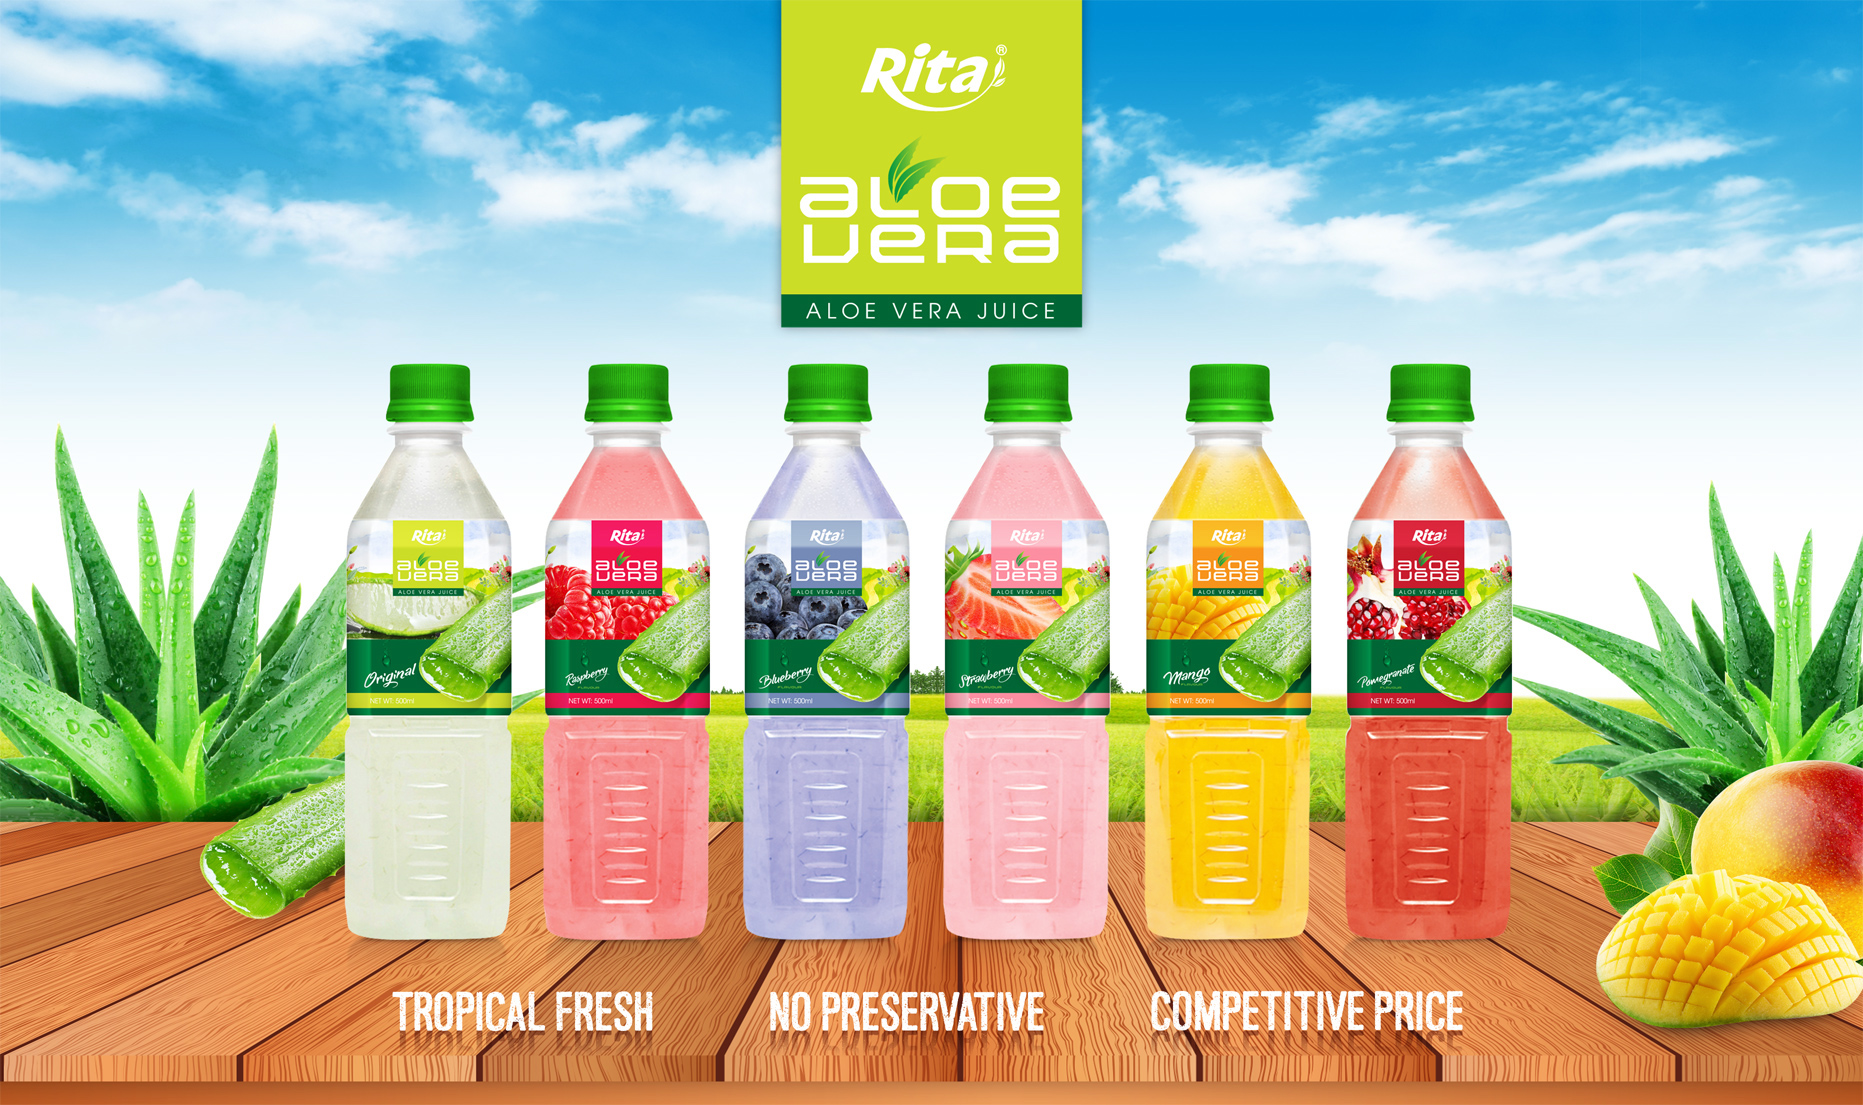 Aloe vera mango juice 500ml Pet bottle